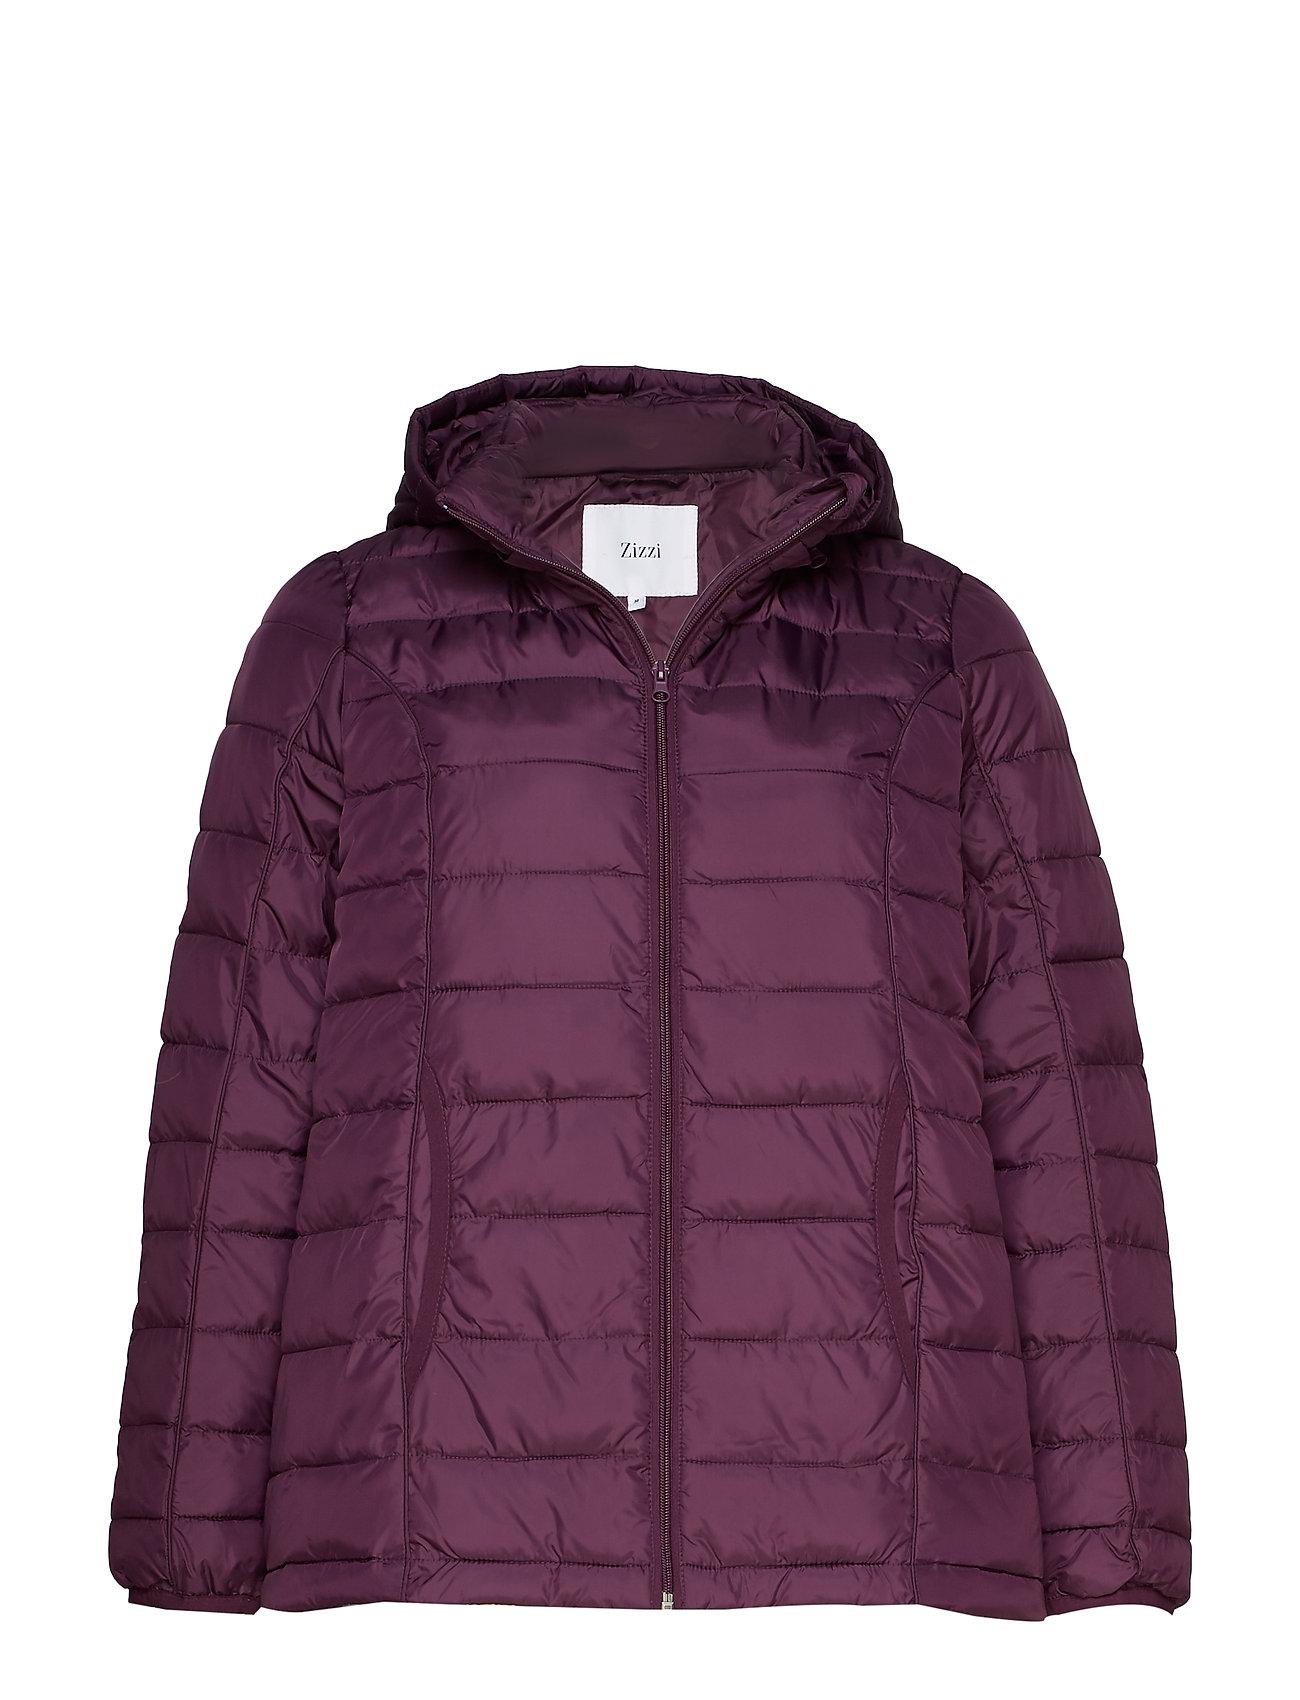 Zizzi Jacket, long sleeve - PURPLE